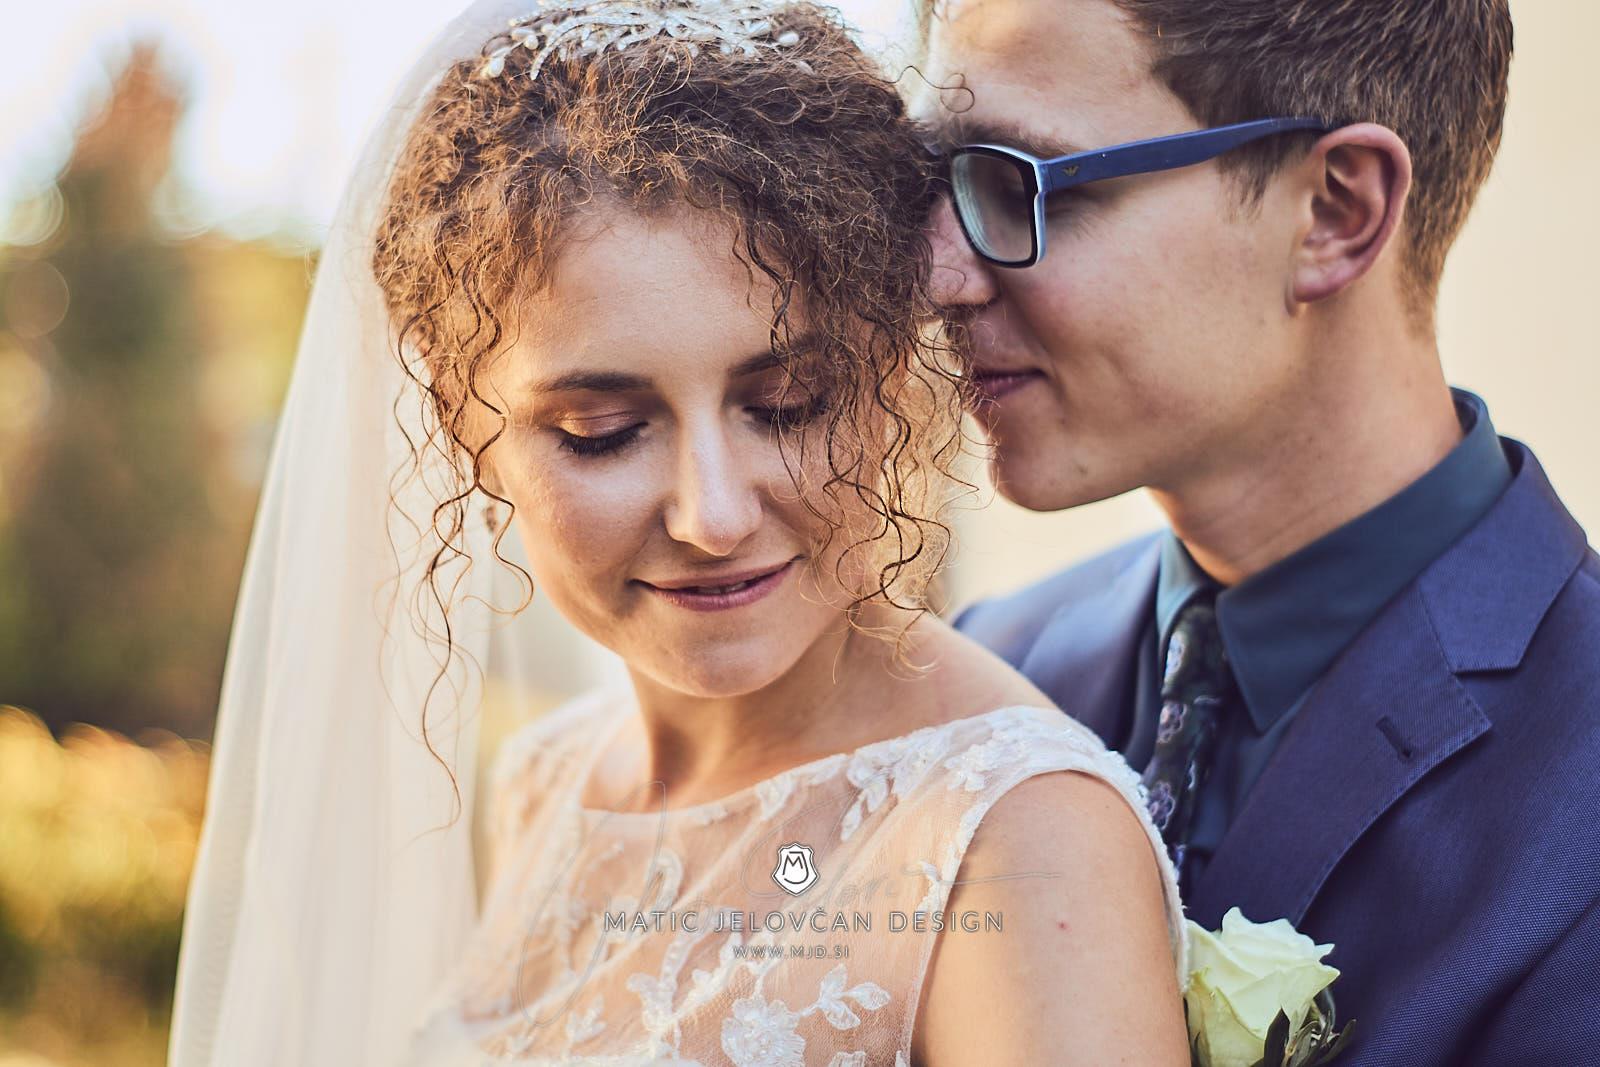 2017 10 07 17.19.37DSC00827 0 Web wm - Laura & Paul's International Wedding